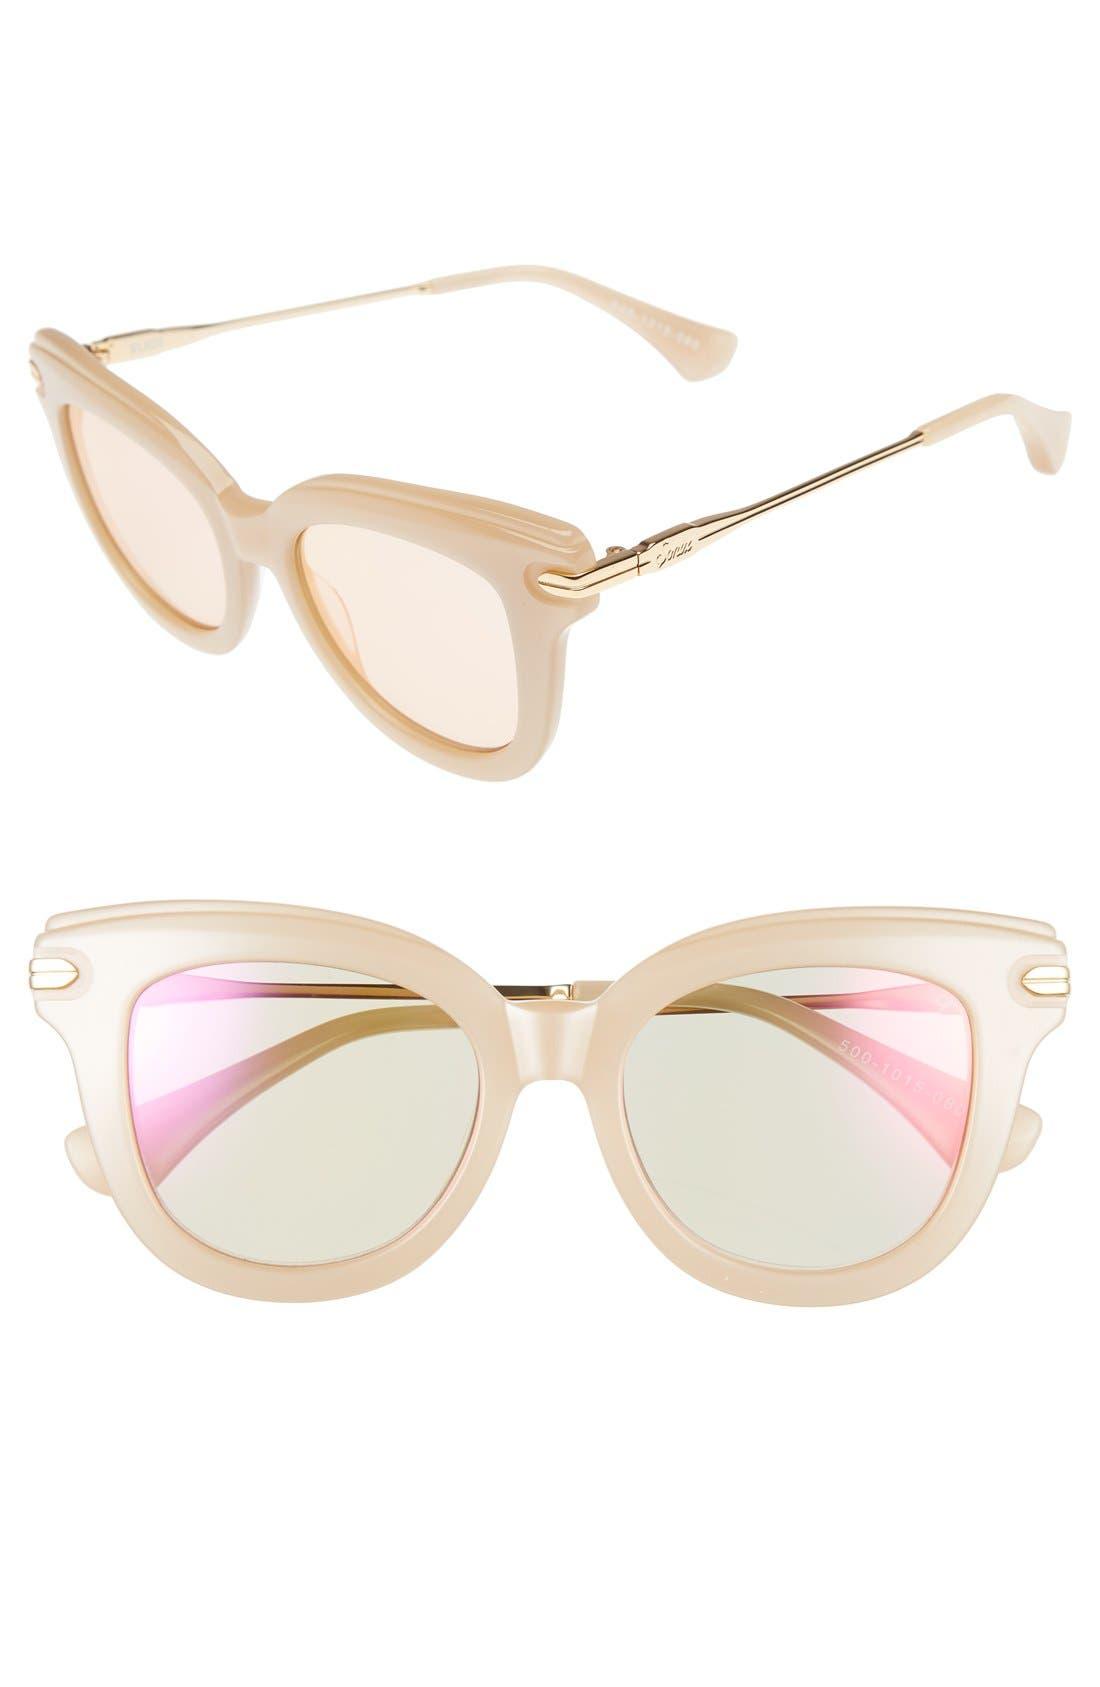 Elliot 48mm Cat Eye Gradient Sunglasses,                             Main thumbnail 1, color,                             Translucent Mirror/ Nude